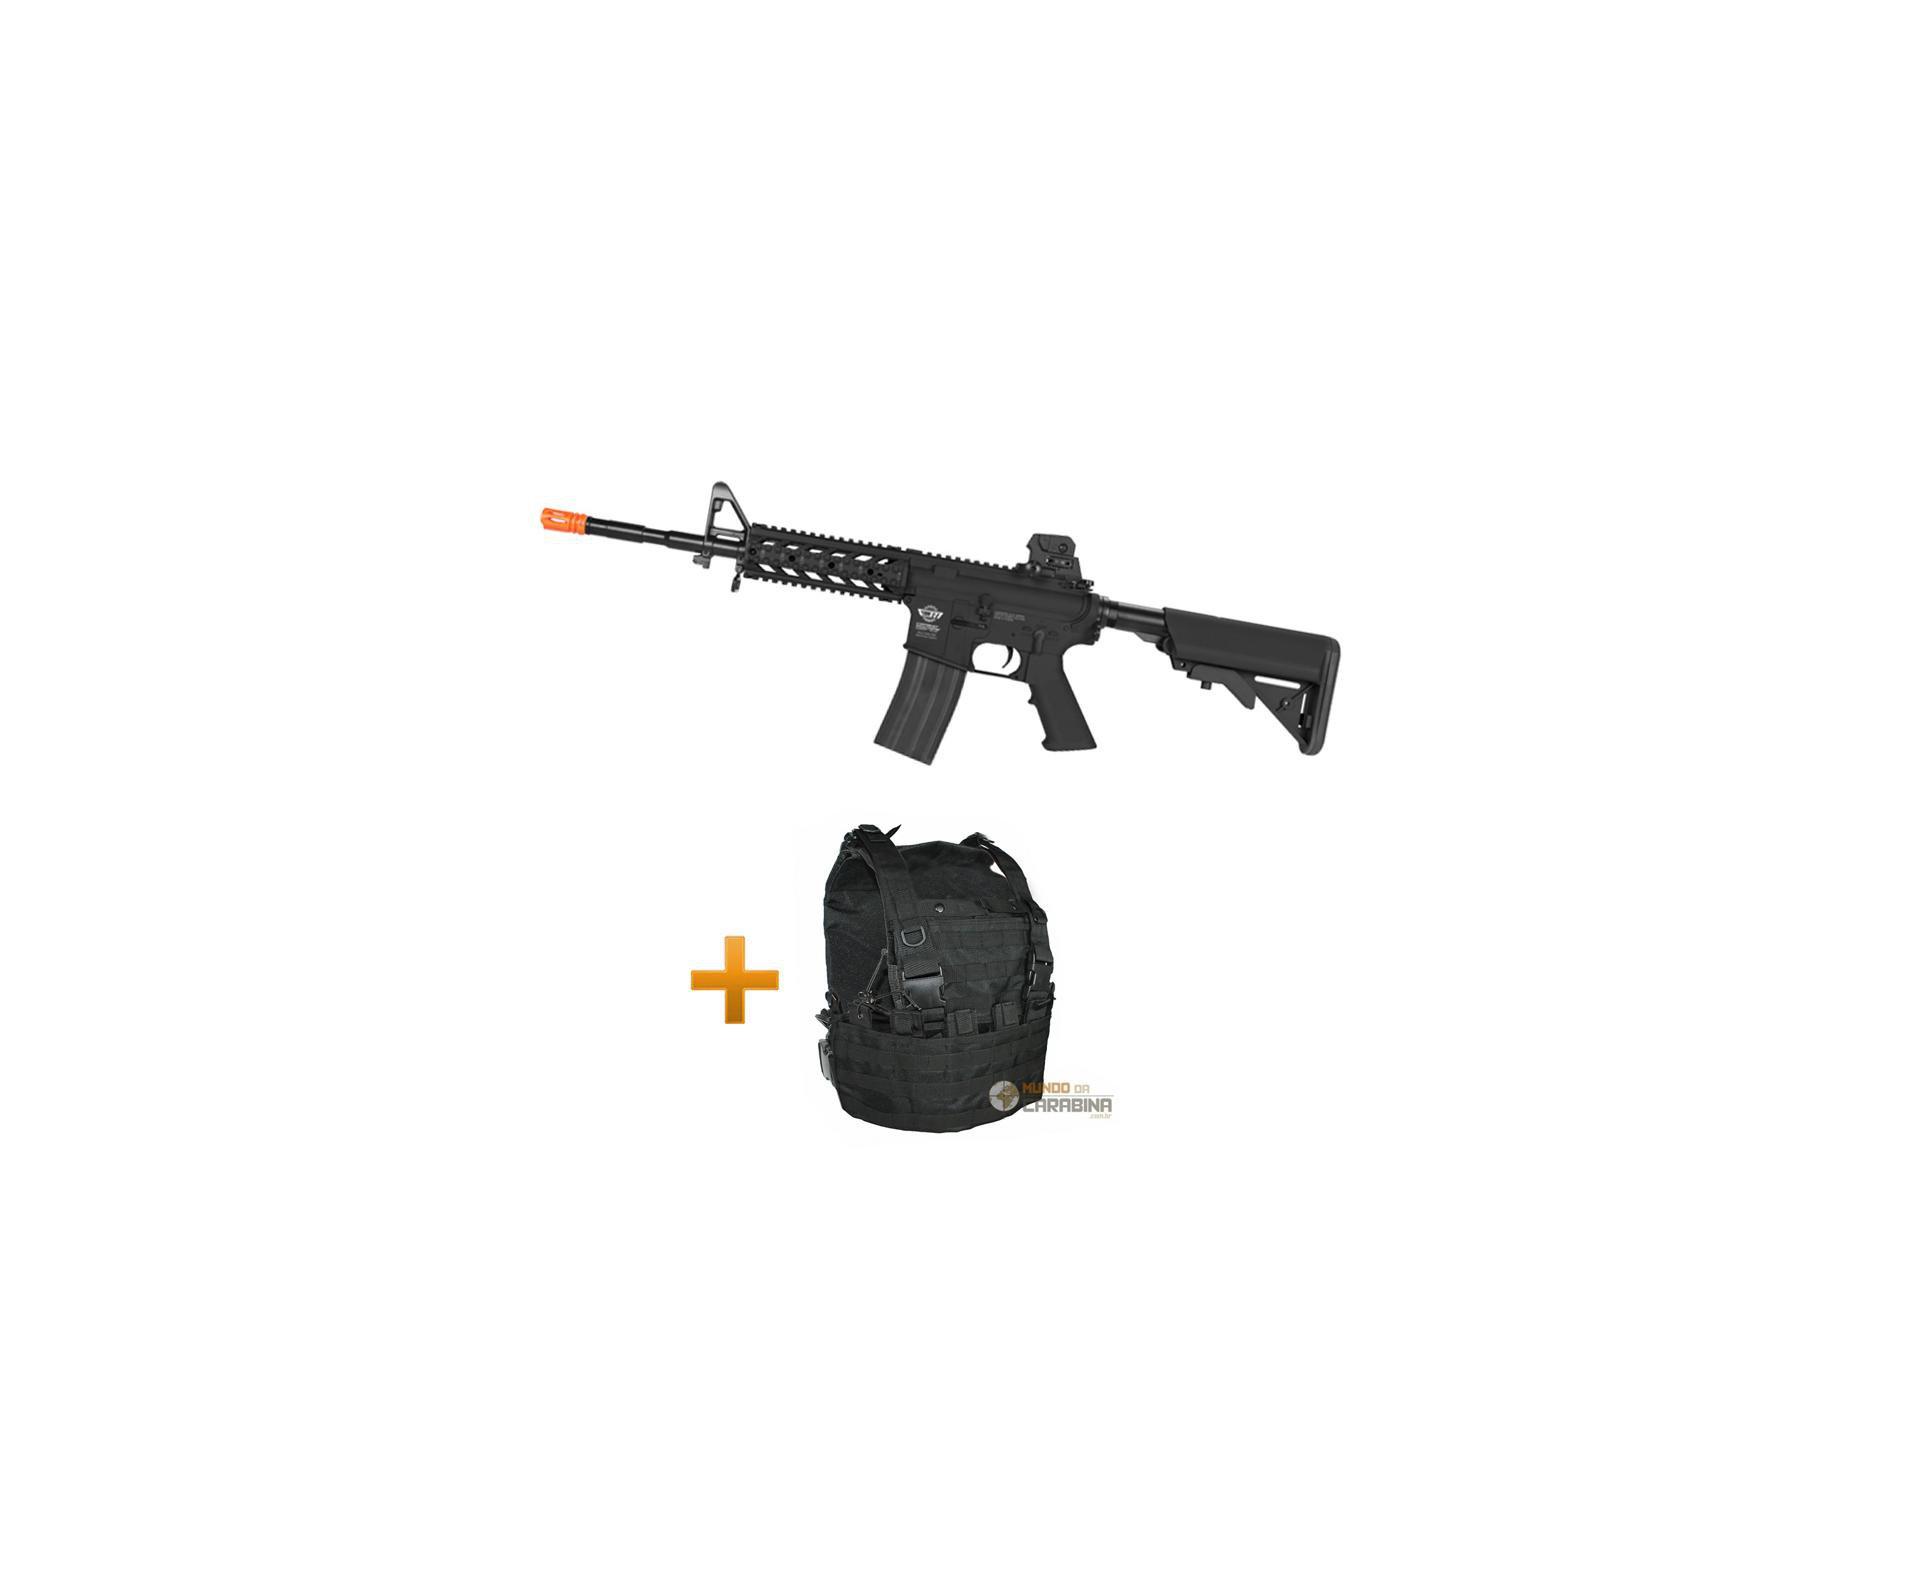 Rifle De Airsoft Cm16 Raider Longo - G&g + Colete Chest Molle Preto - Swiss Arms